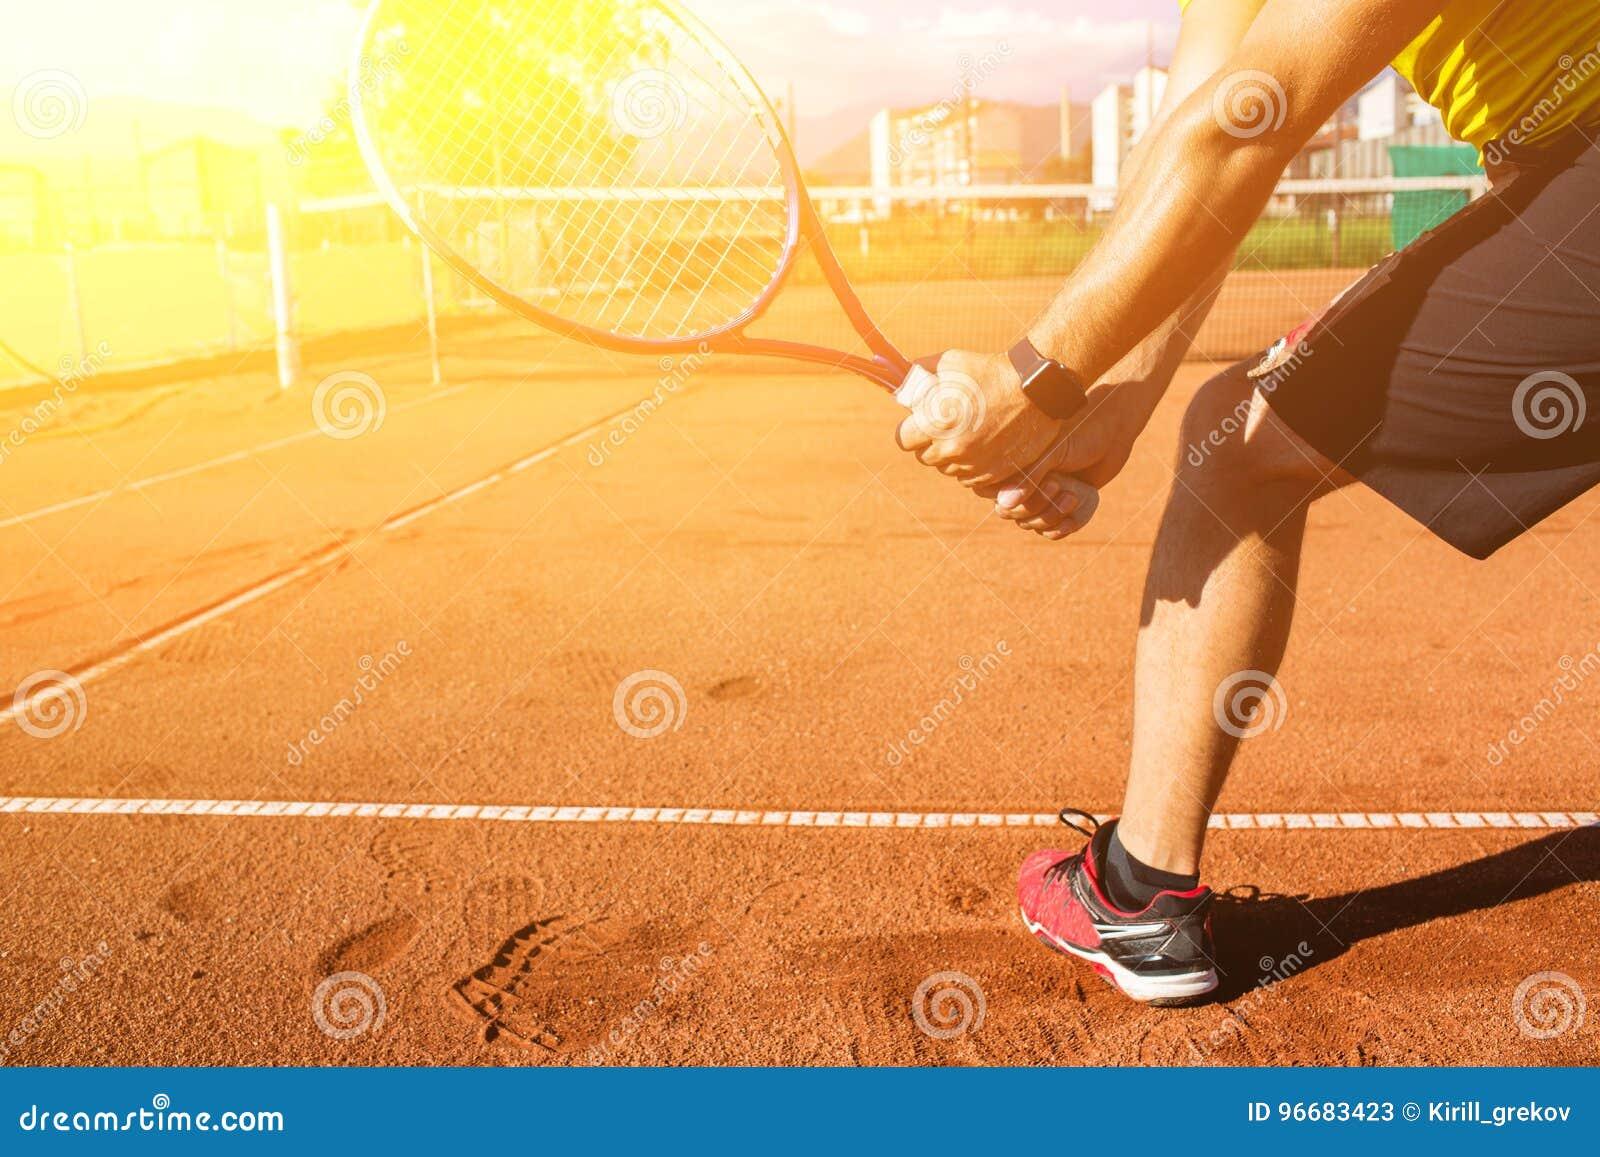 Main masculine avec la raquette de tennis